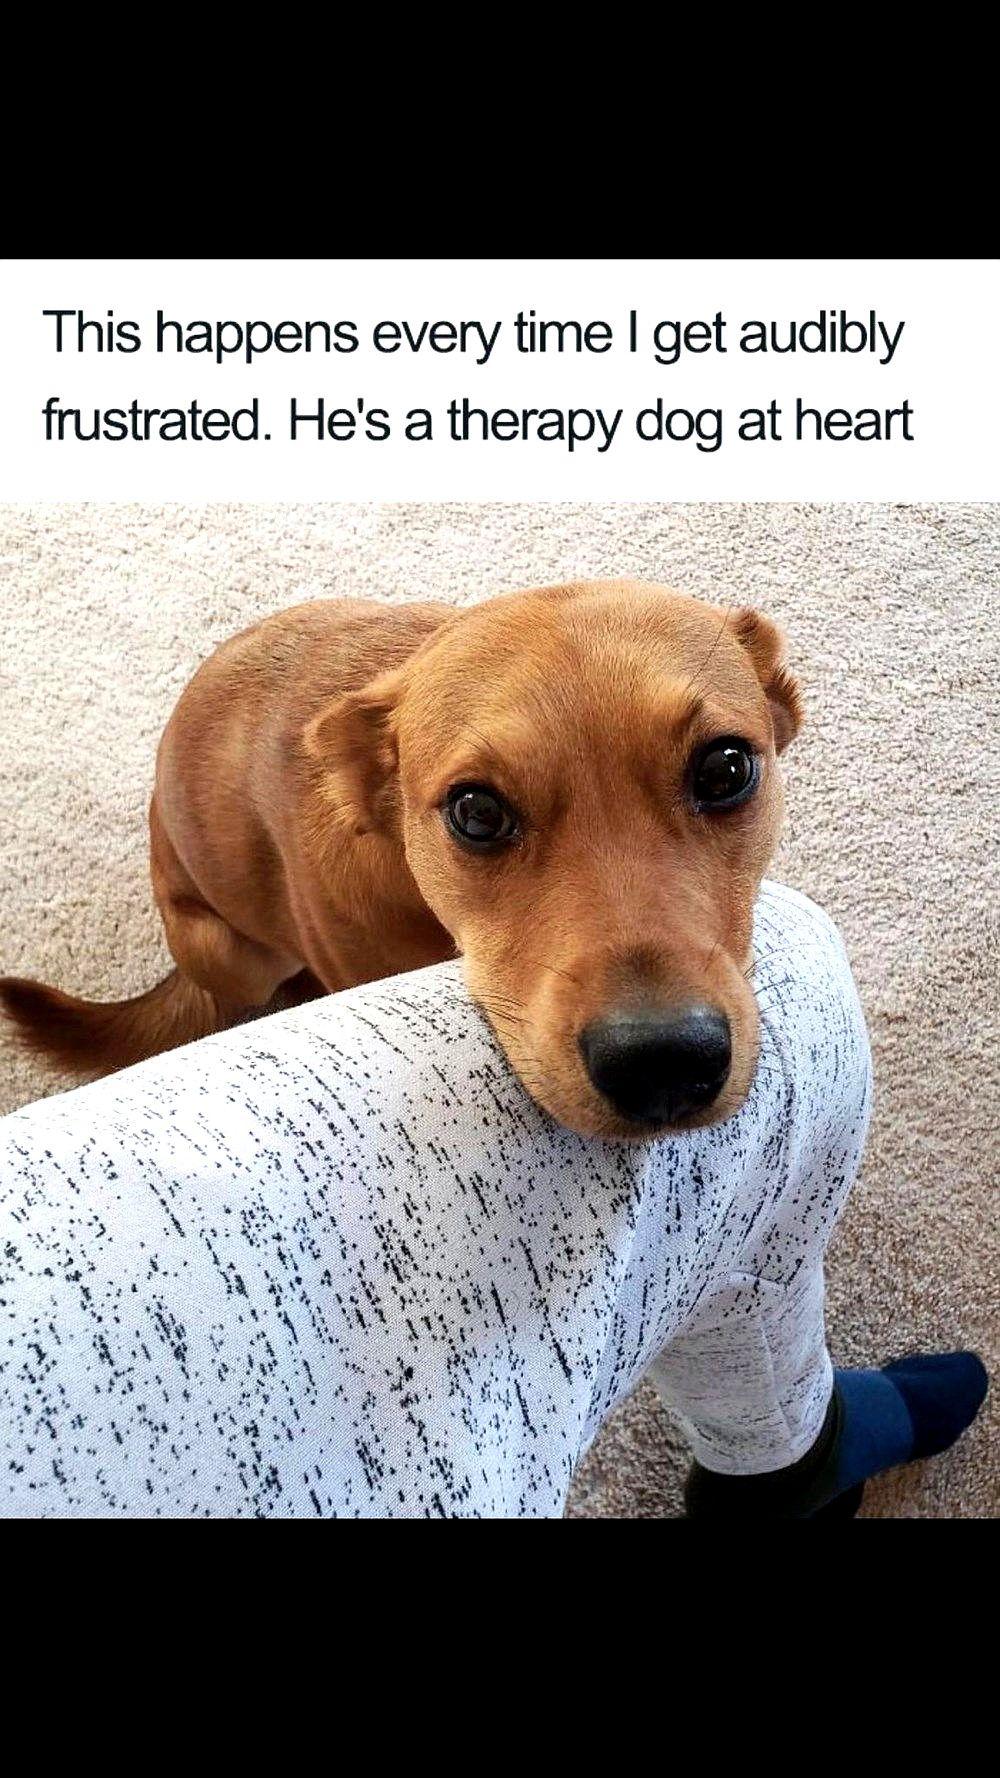 Laughing So Hard Dog Meme Dog Meme Baby Daddy Funny Dog Memes Cute Dogs Cute Baby Animals